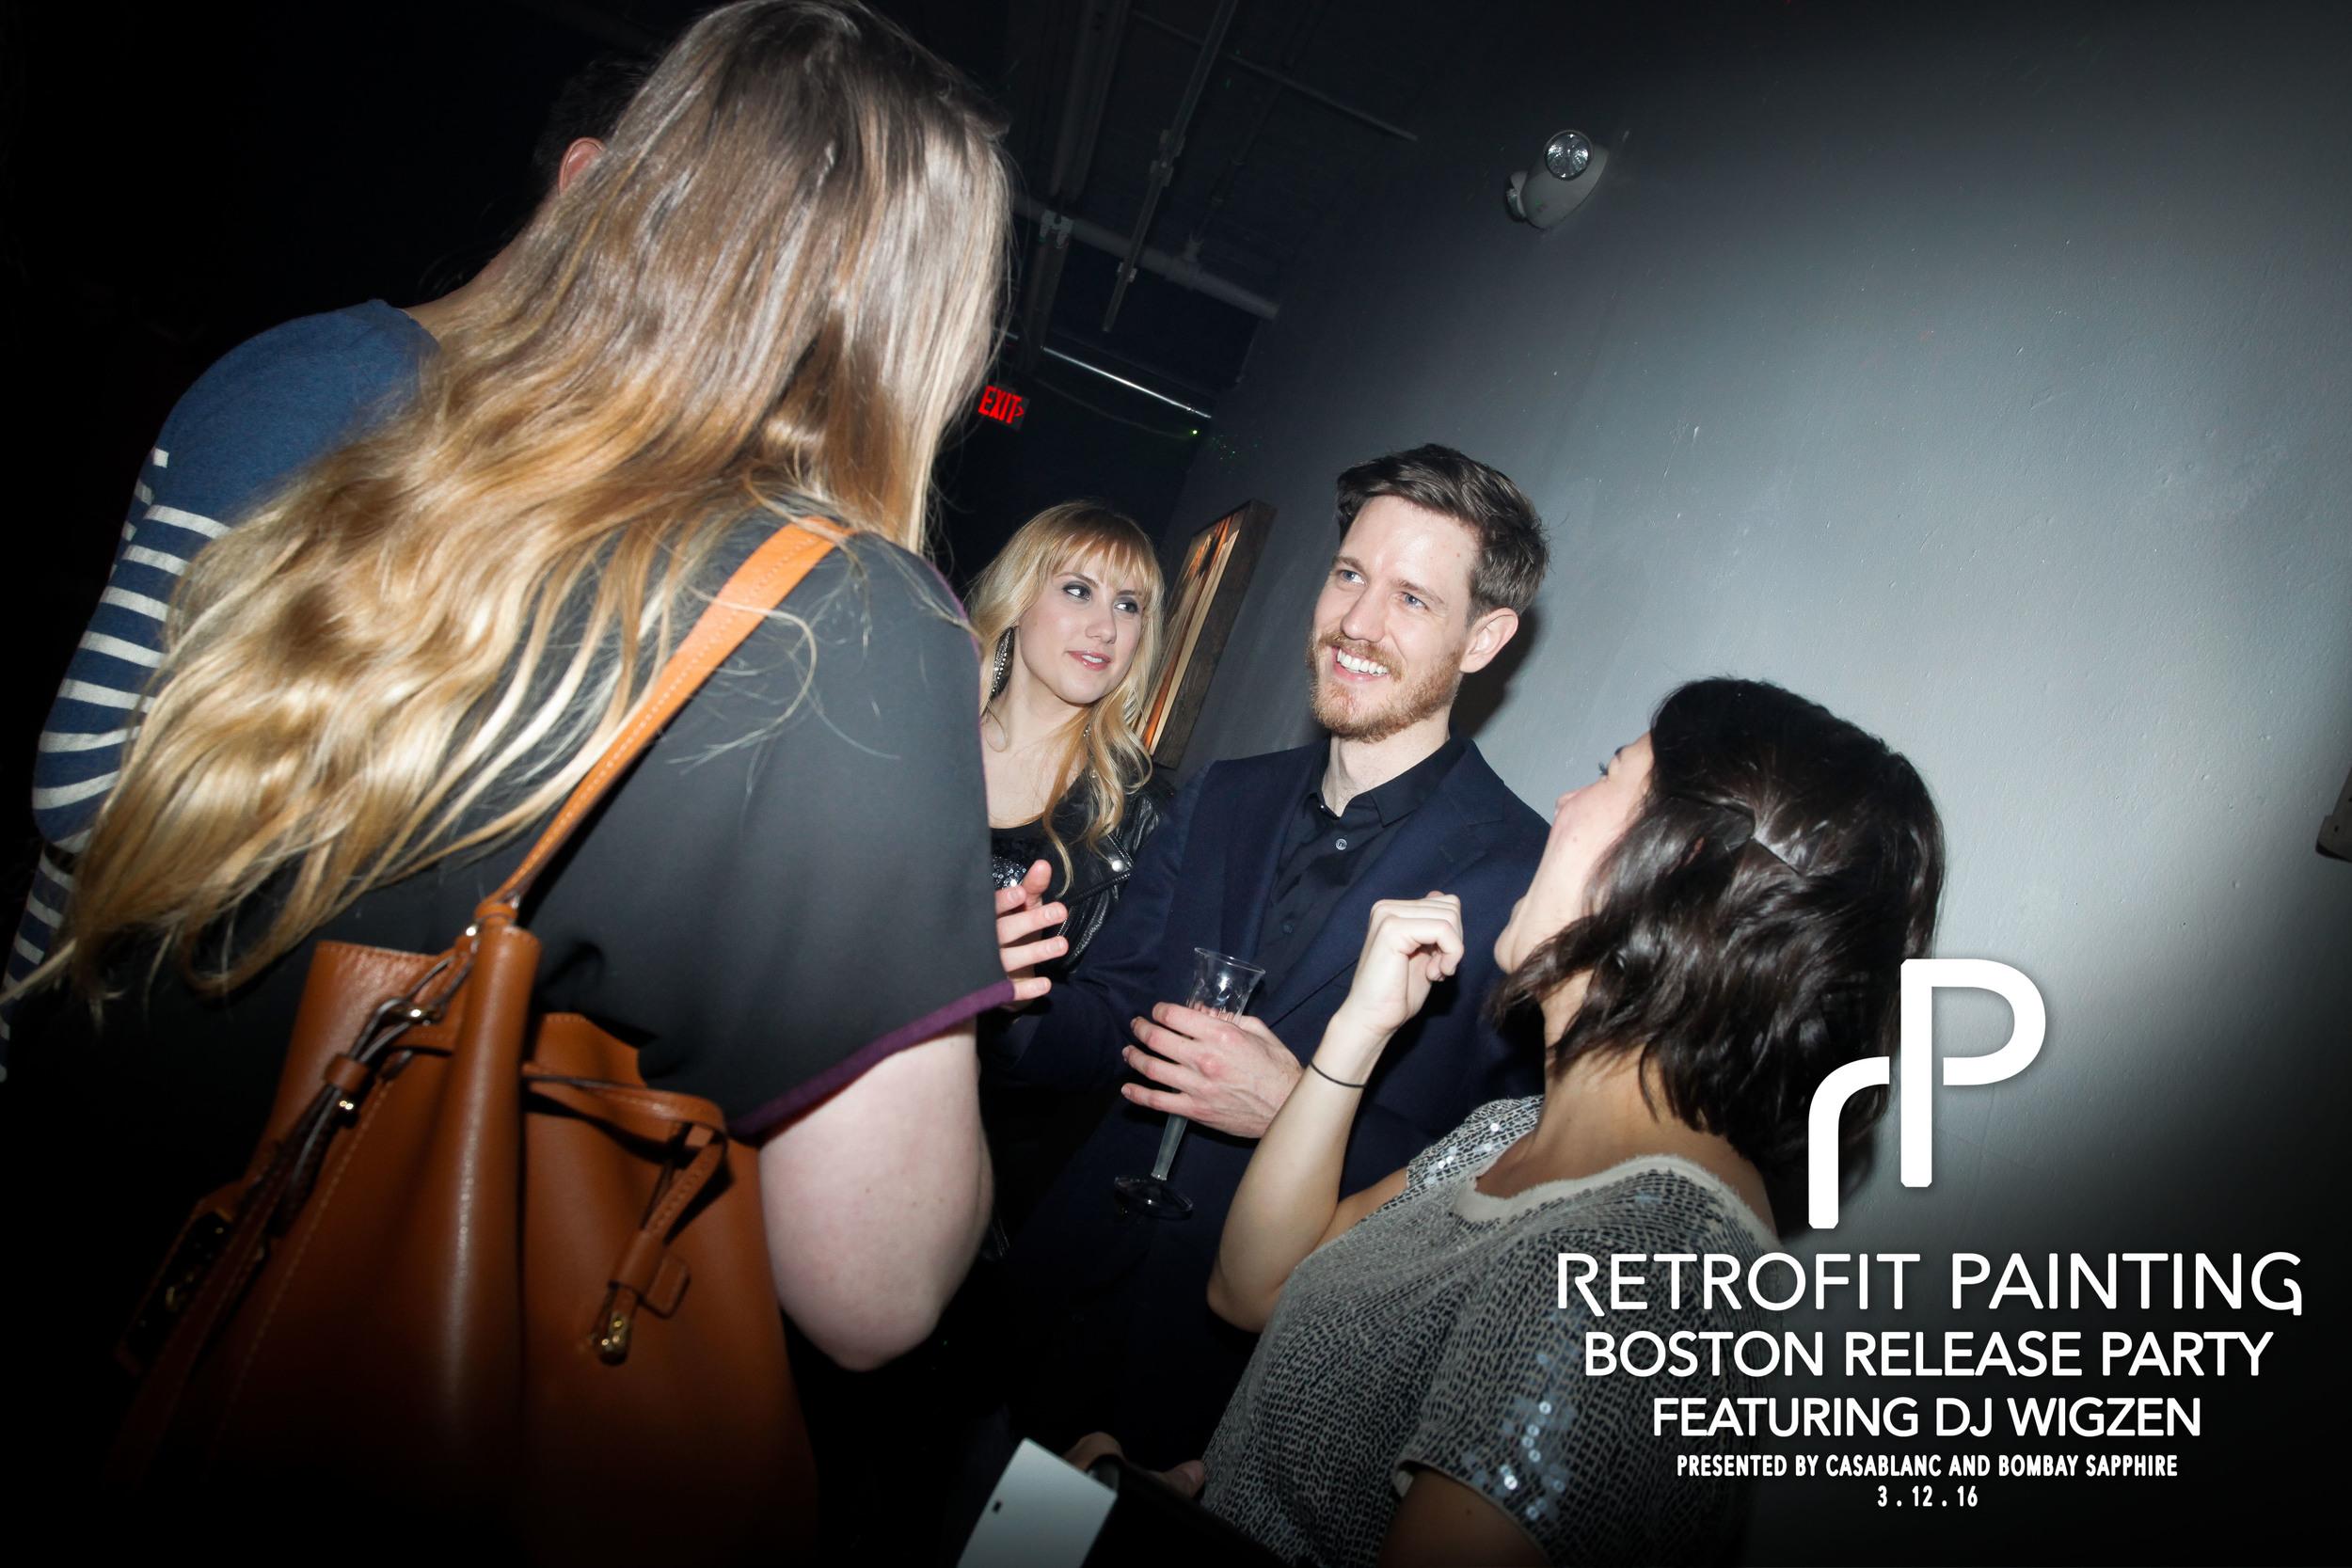 Retrofit Painting Boston Release Party 0113.jpg